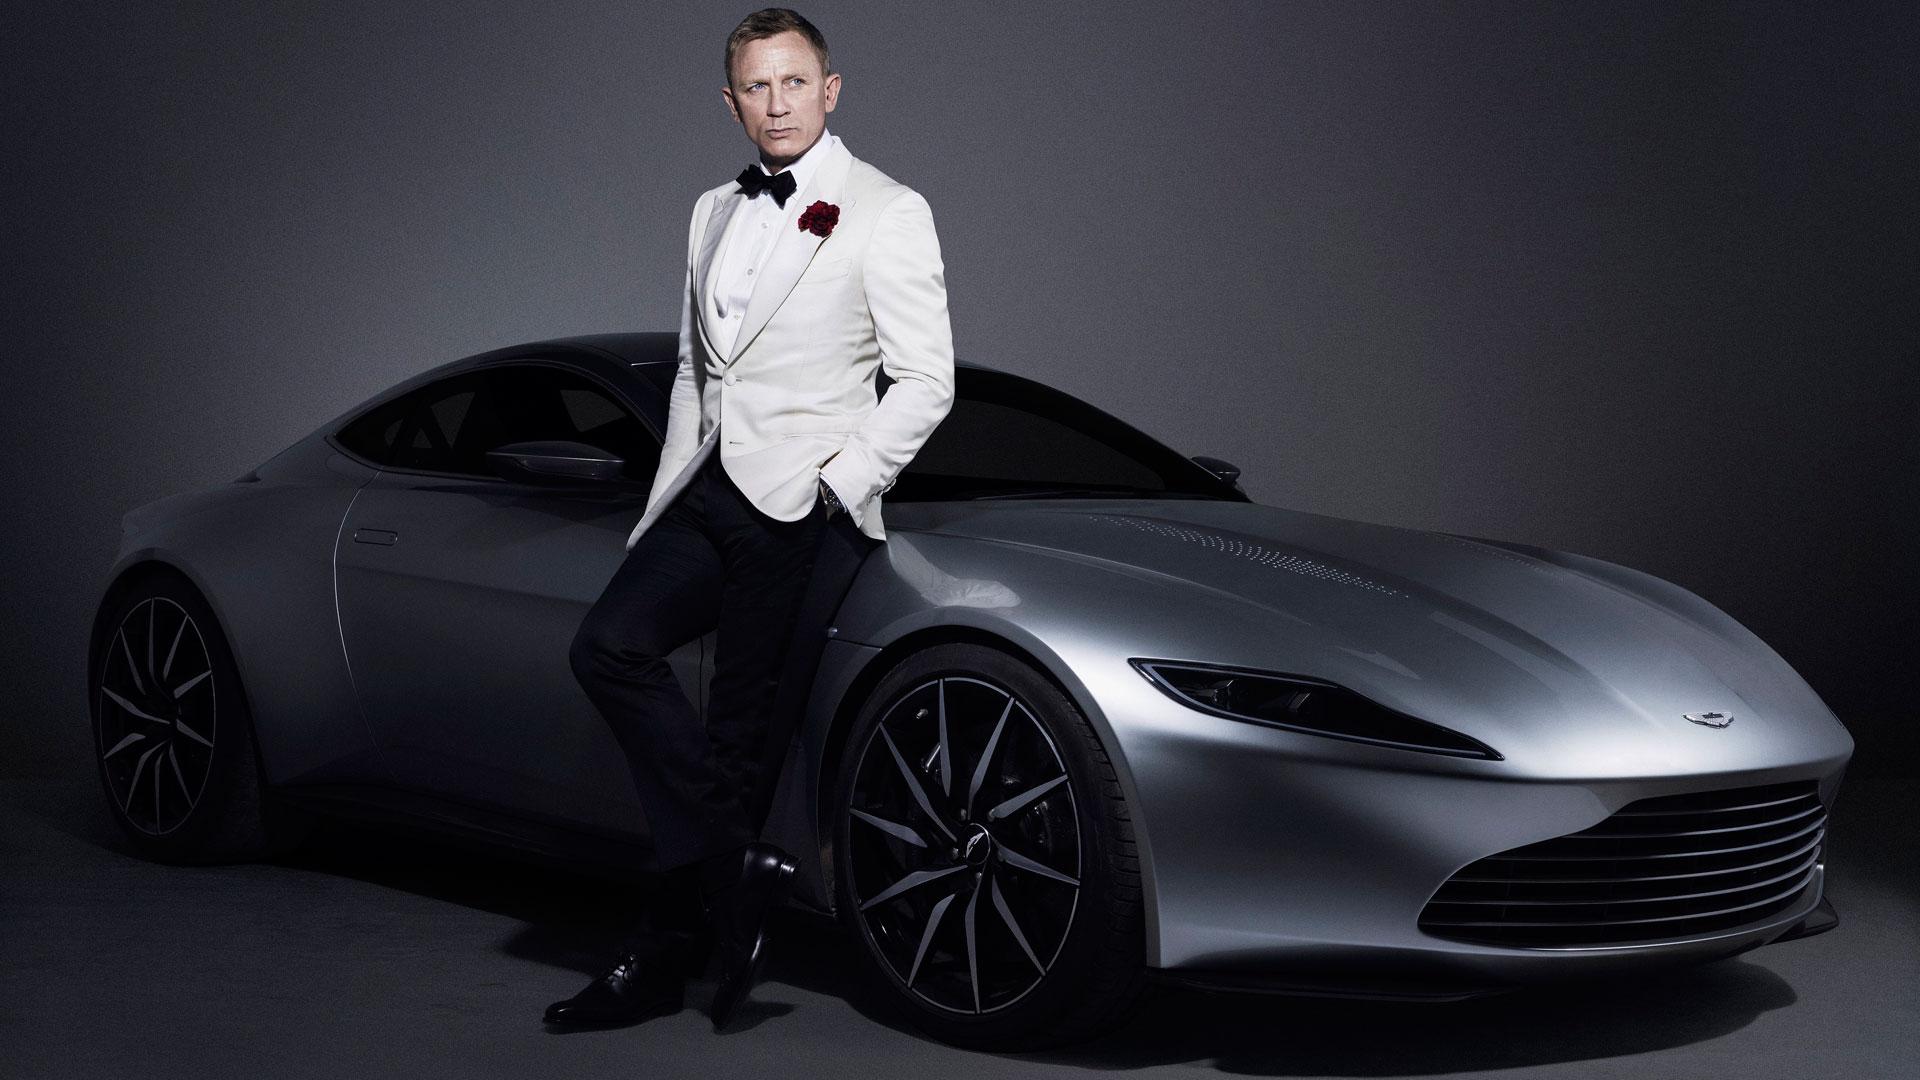 Daniel-Craig-Aston-Martin